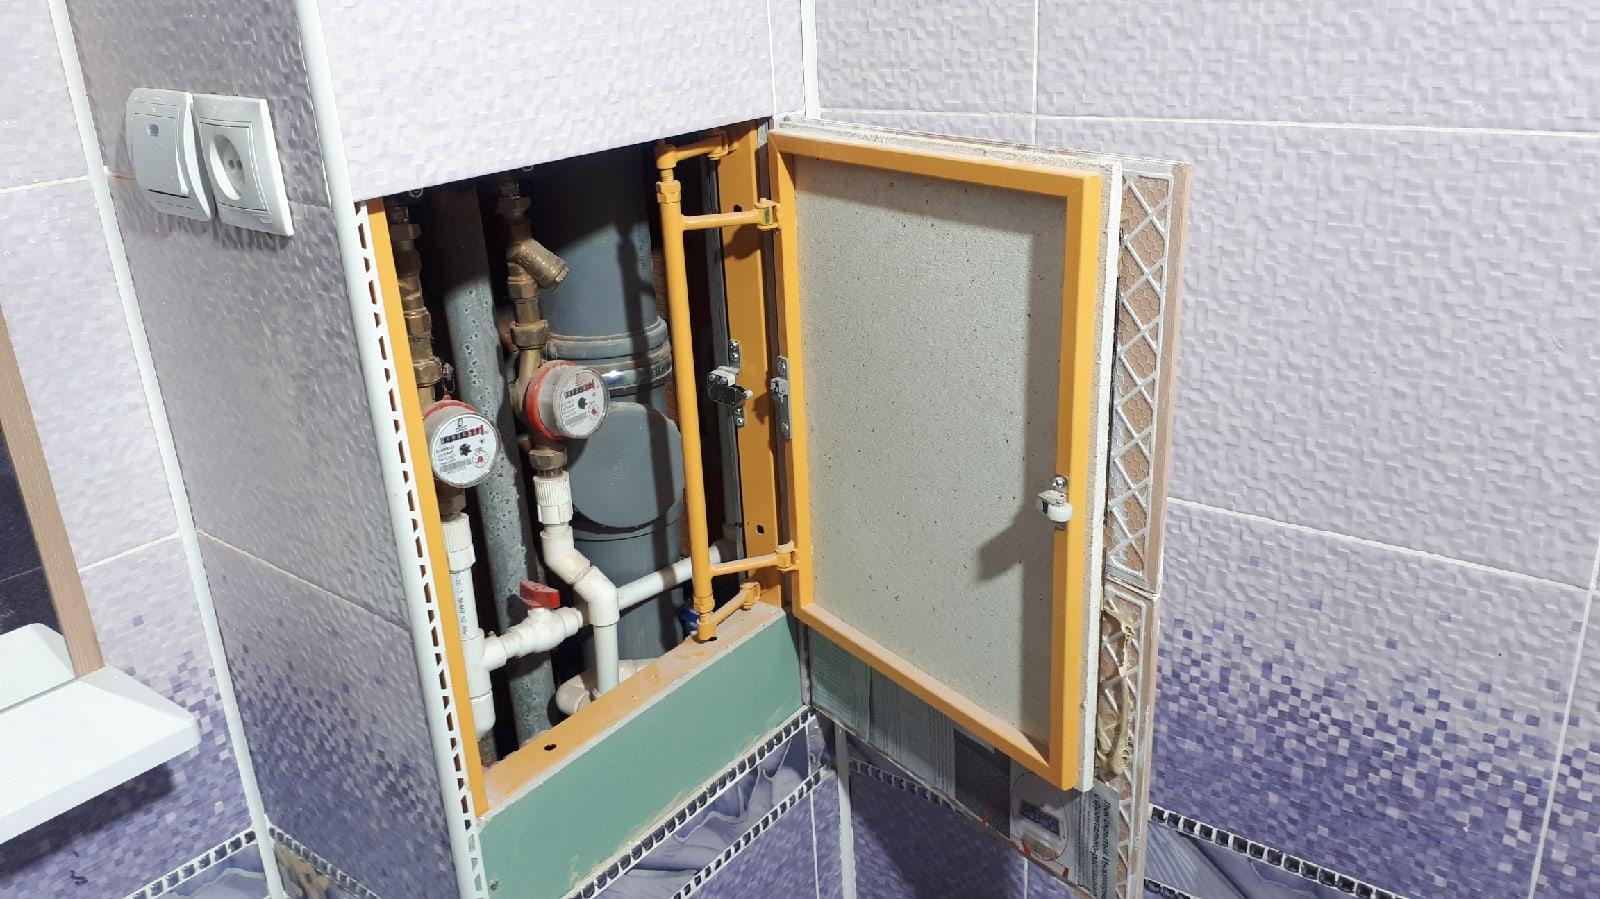 установка люка невидимки в ванной комнате